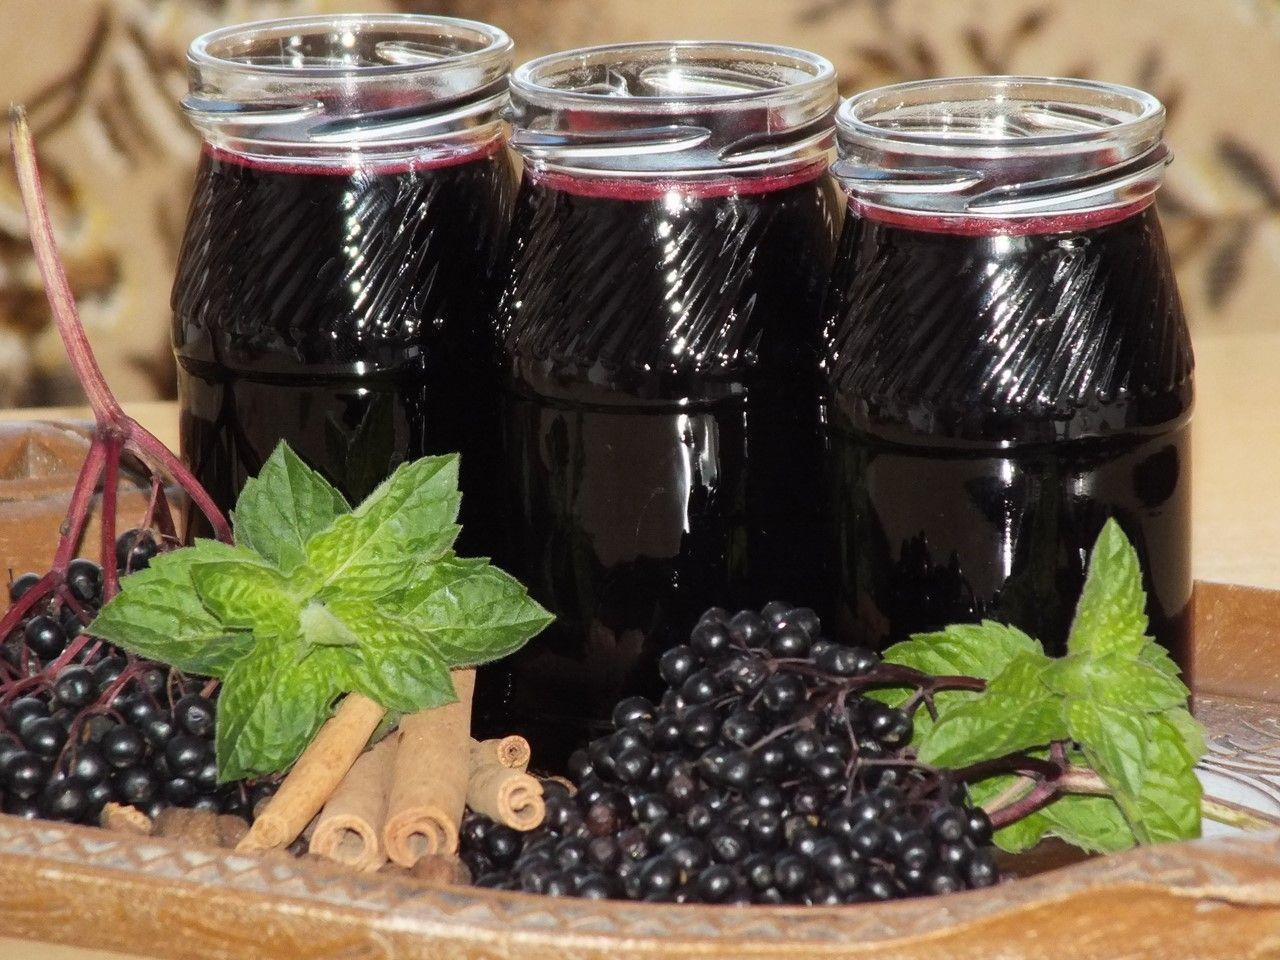 Rozgrzewajacy Syrop Z Czarnego Bzu Recipe Food And Drink Canning Recipes Liqueurs Recipes